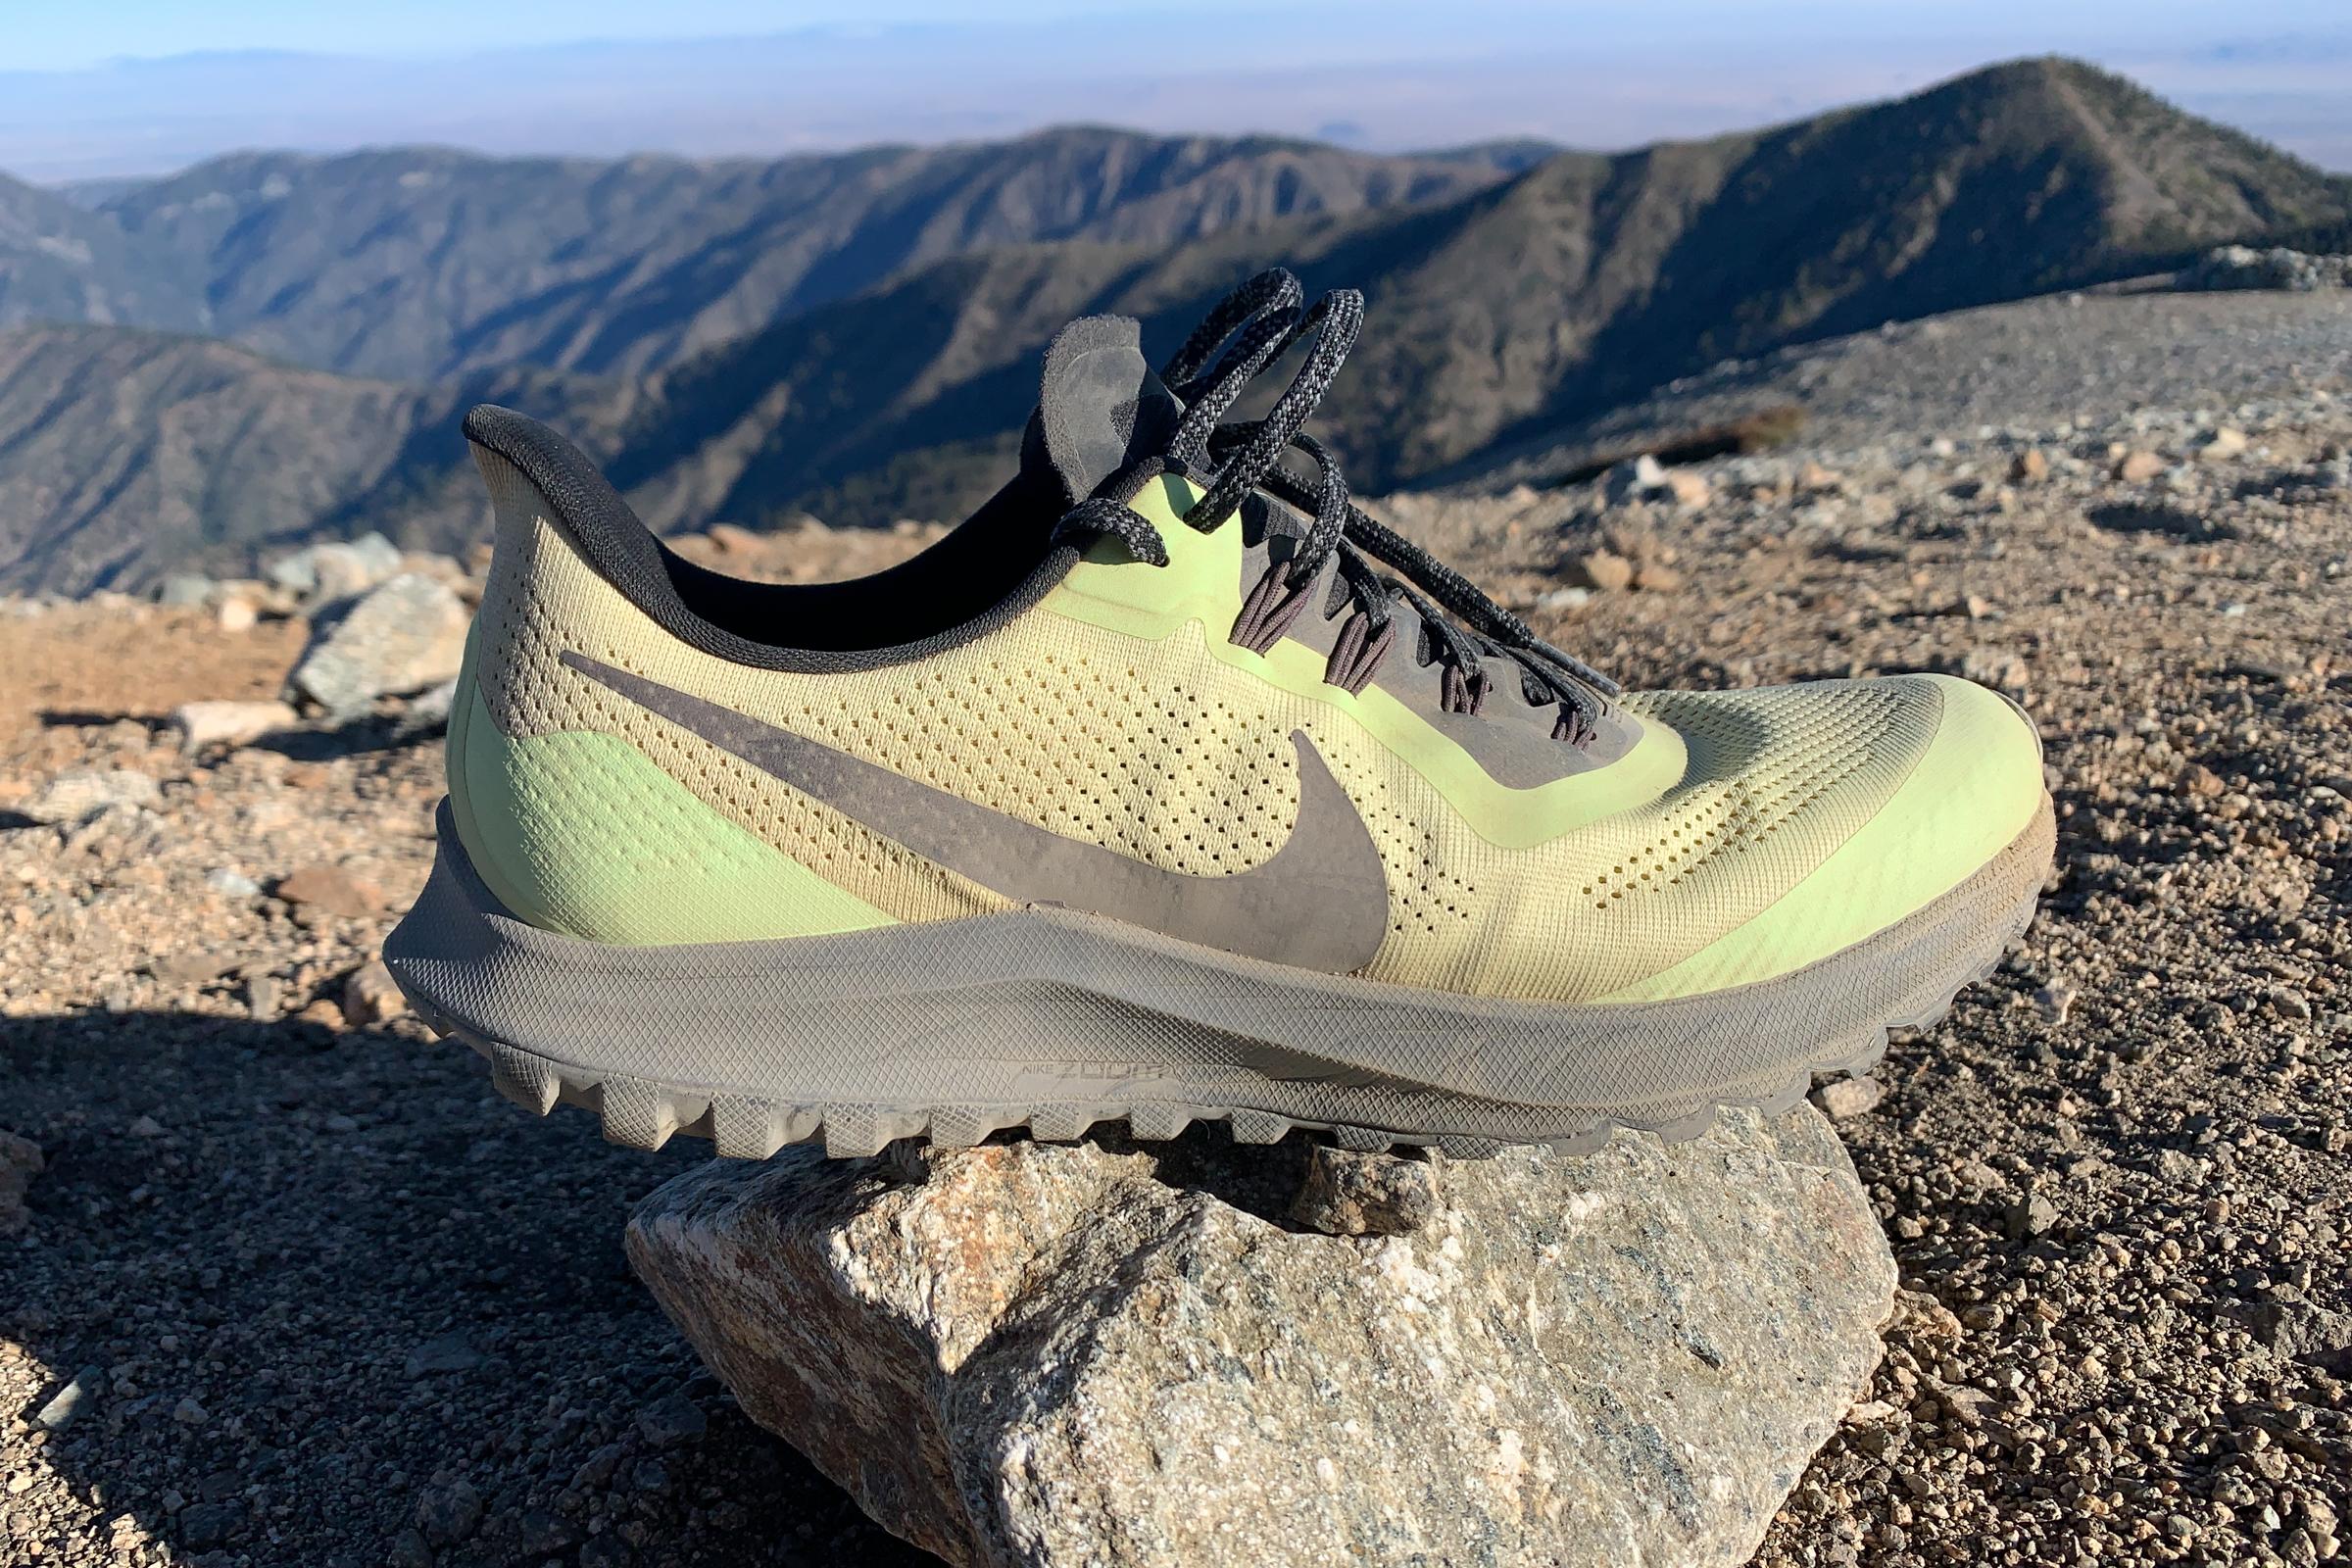 Nevada seno Prestador  Gear Review: Nike Air Zoom Pegasus 36 Trail Shoe - Trail to Peak